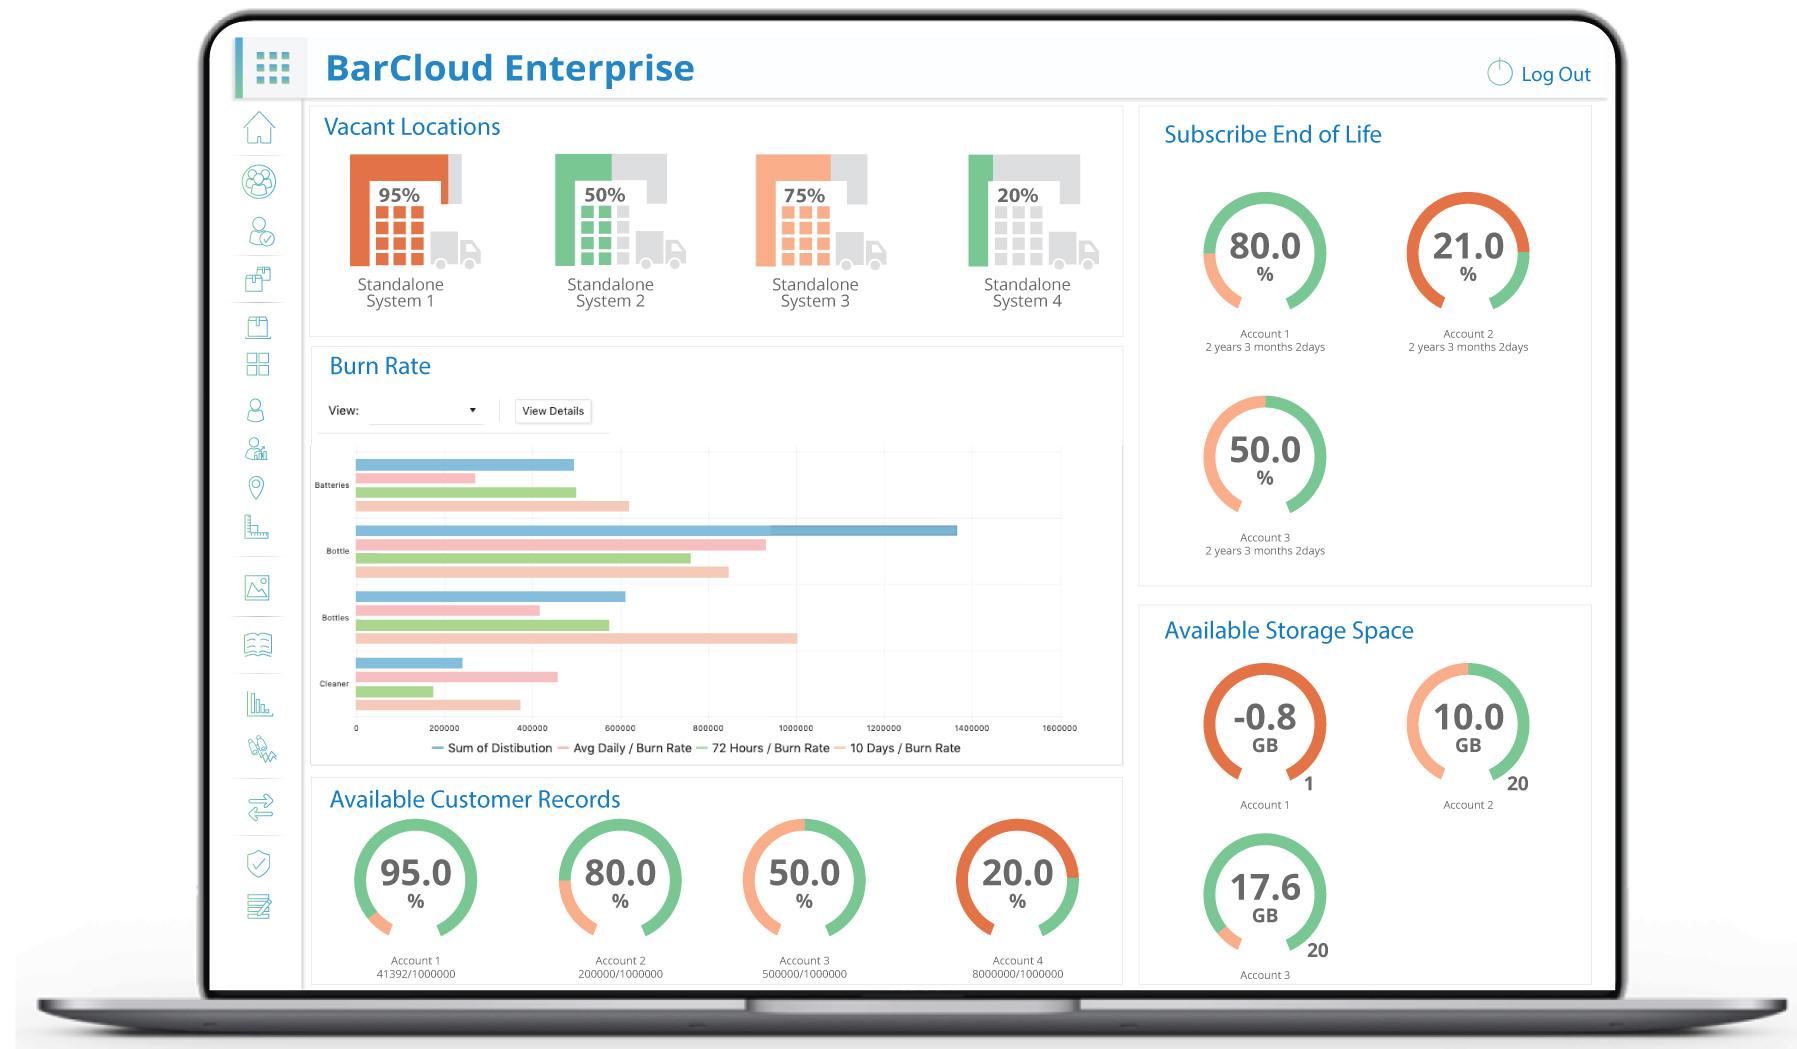 inventory system enterprise image7